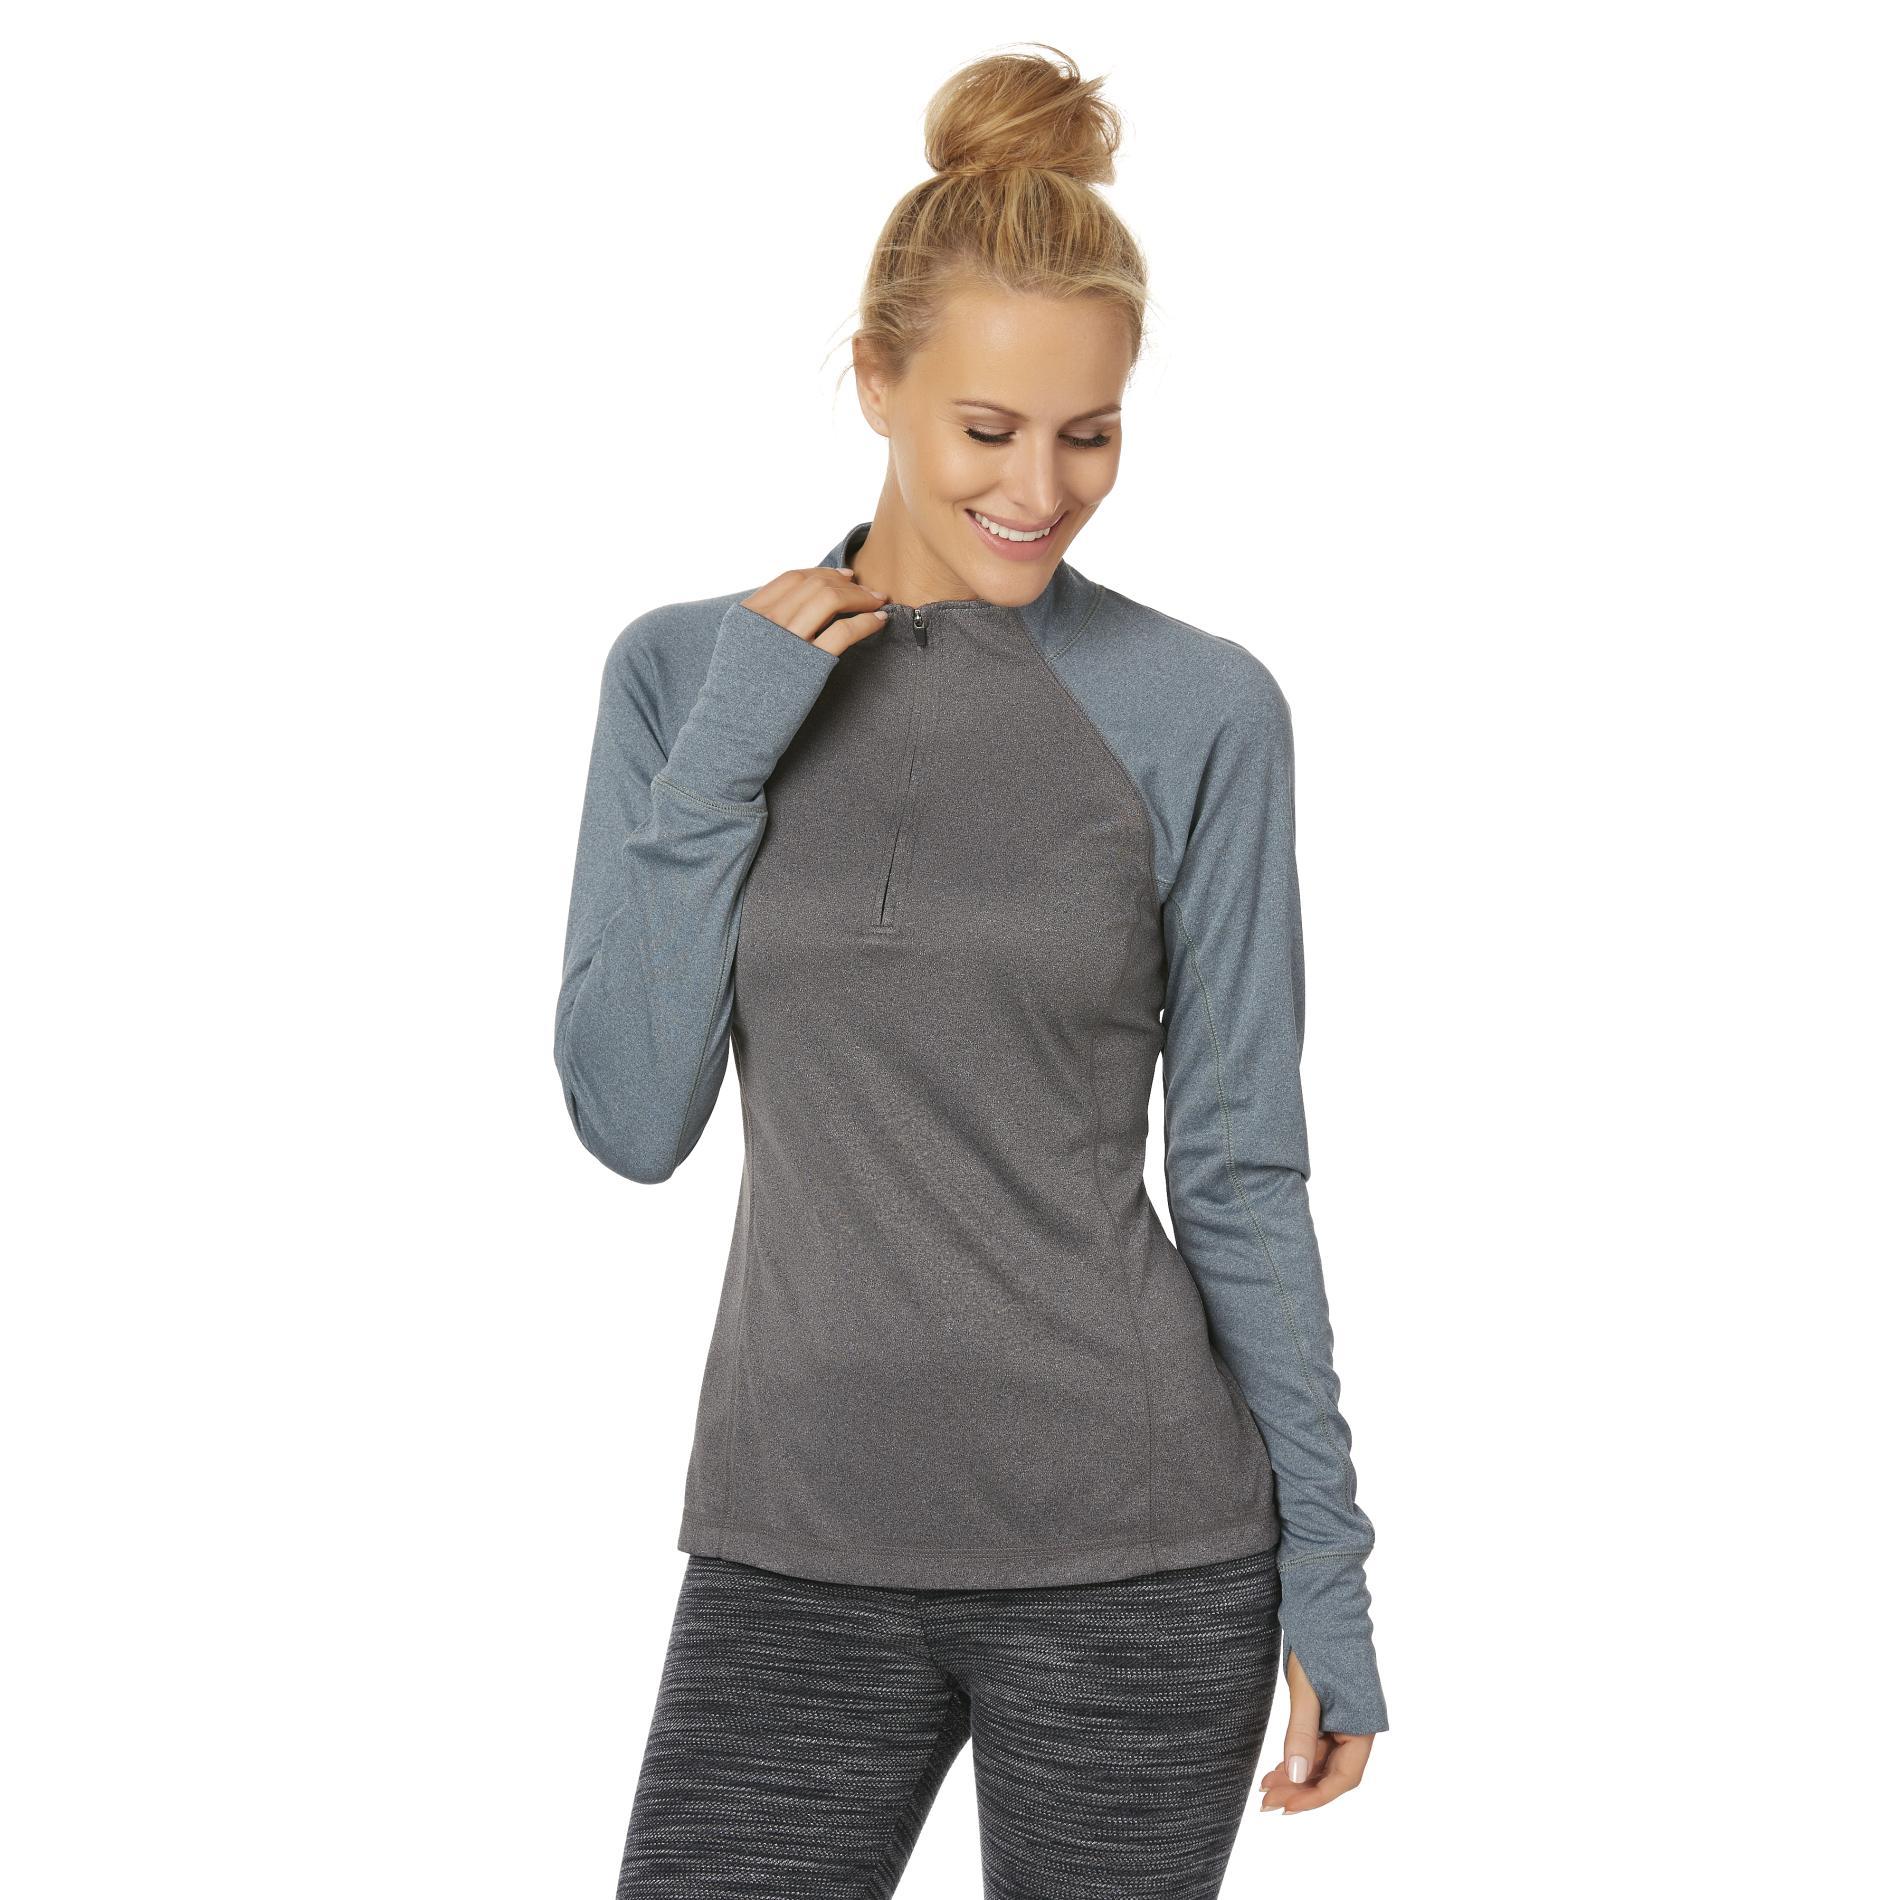 Everlast® Women's Quarter-Zip Performance Shirt - Colorblock PartNumber: 007VA92402412P MfgPartNumber: WP7EL78219MI